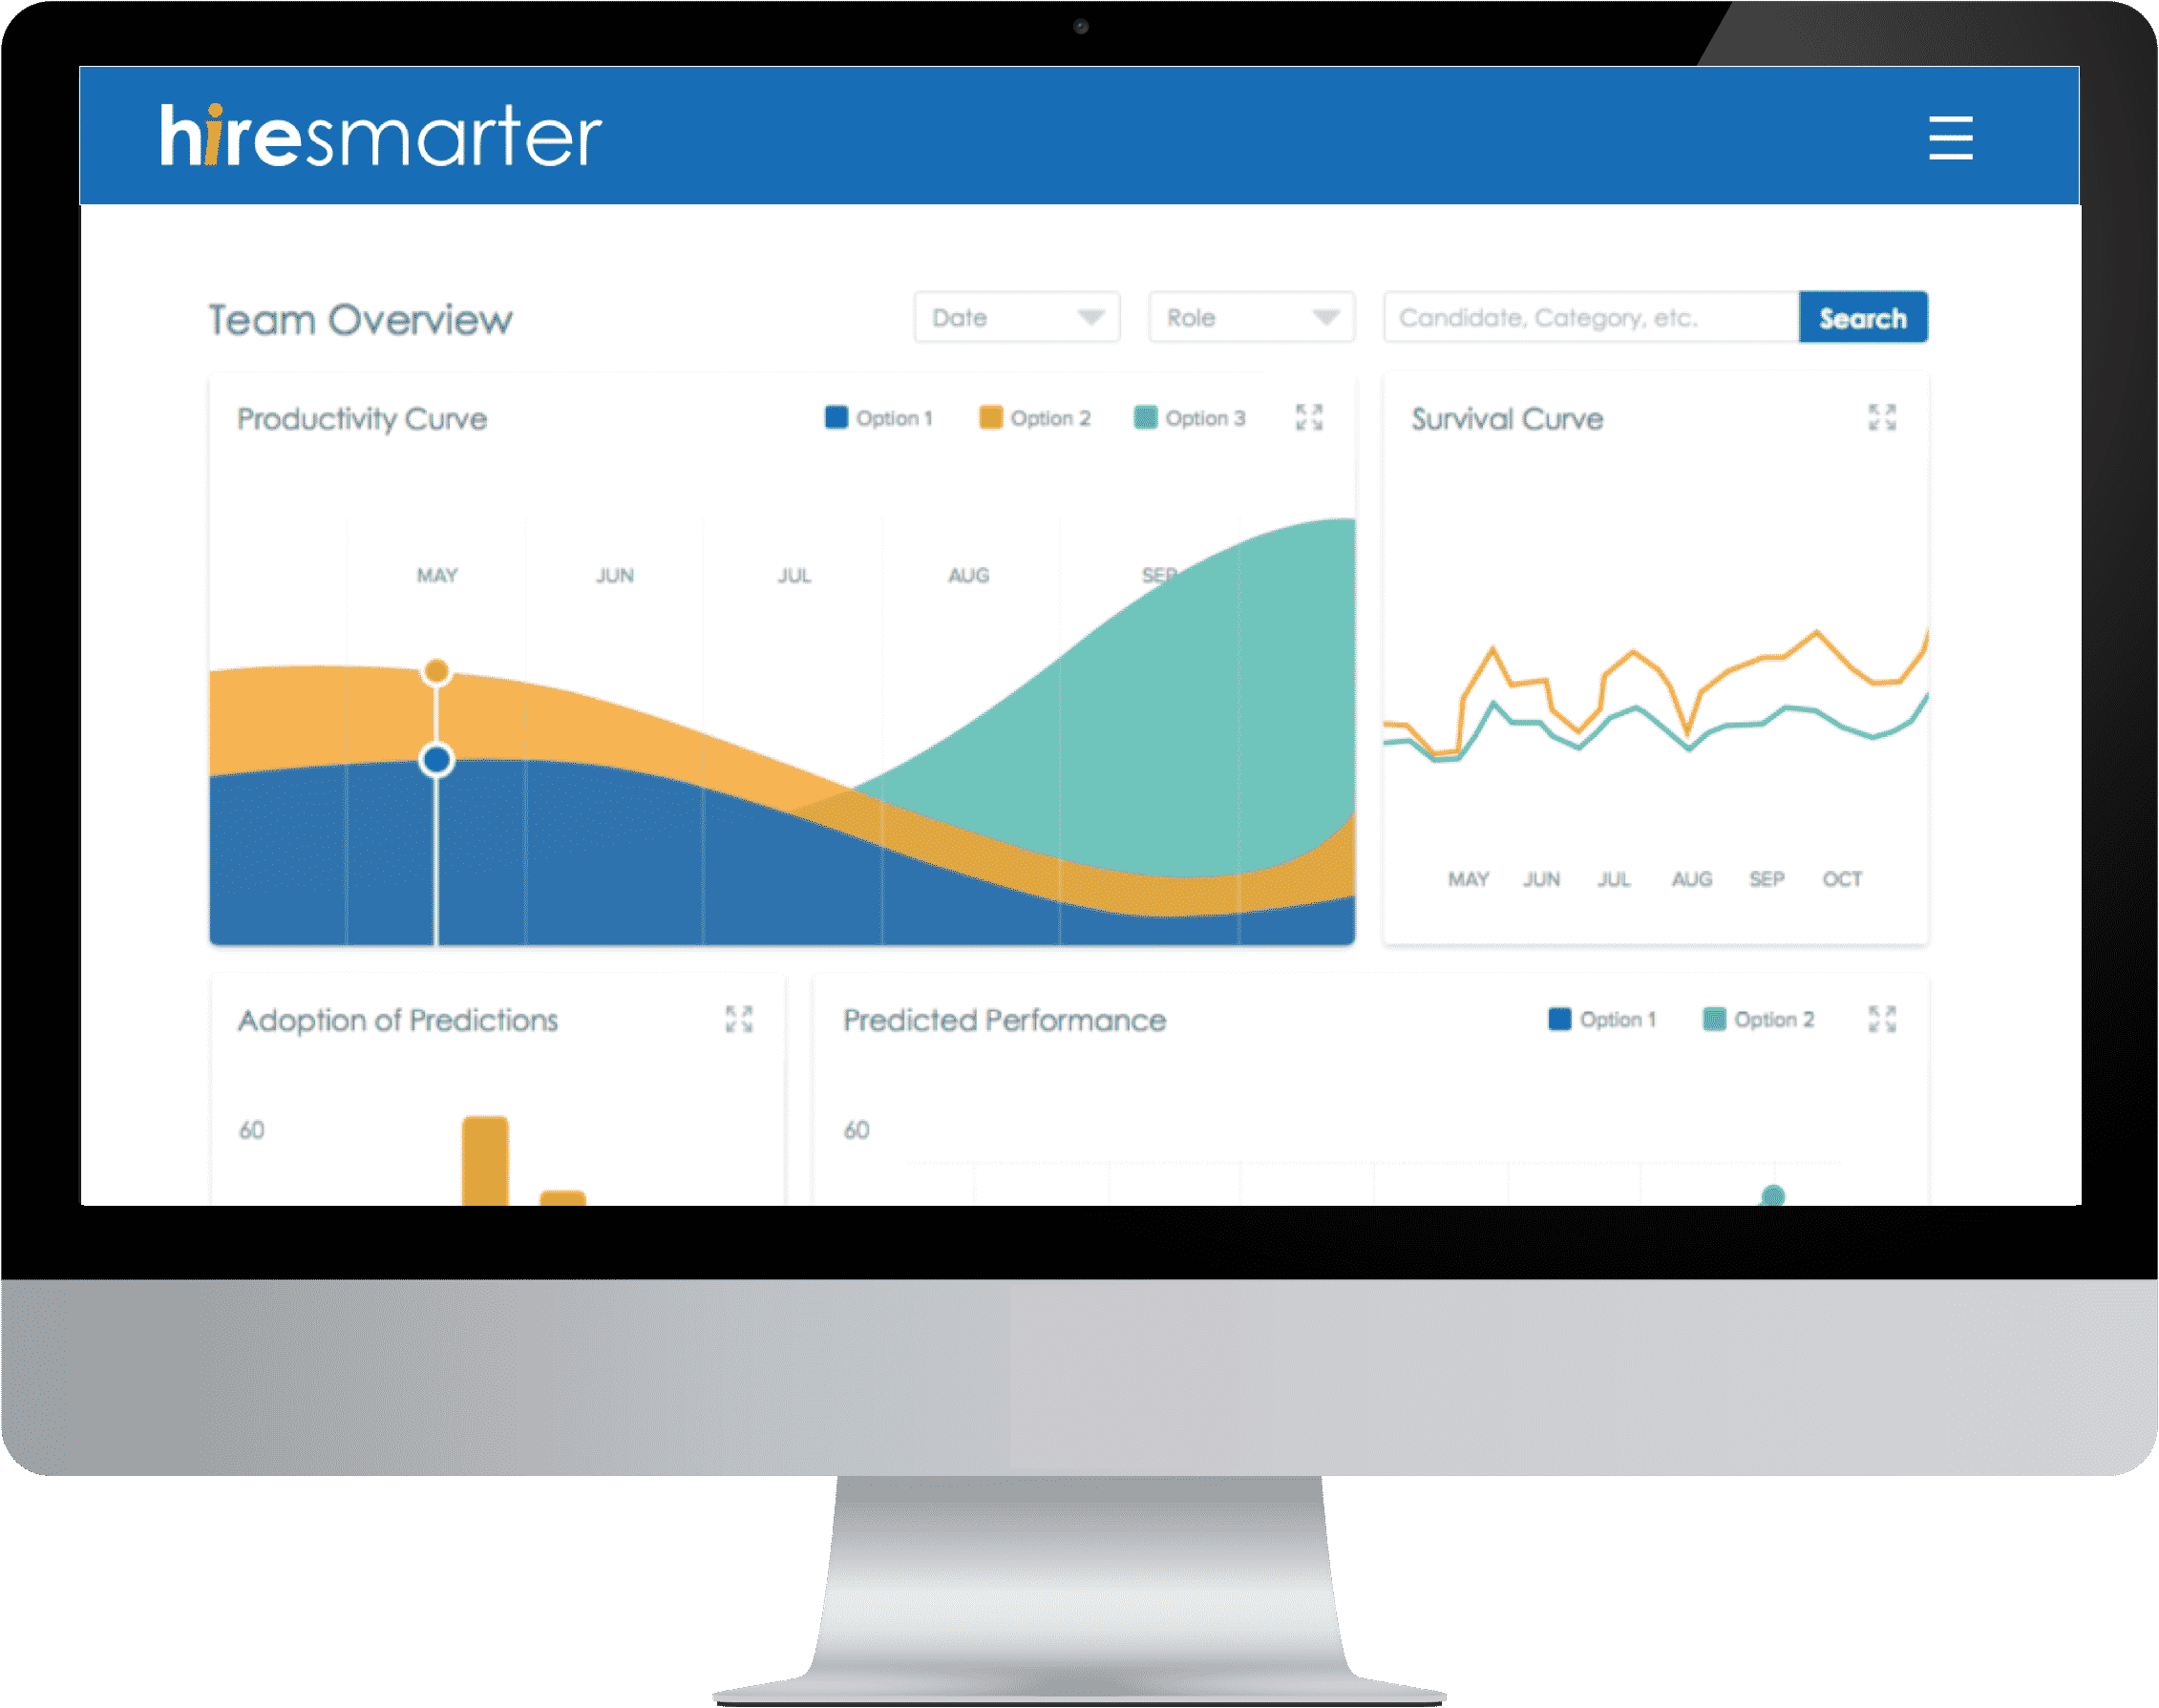 Hire Smarter Analytics